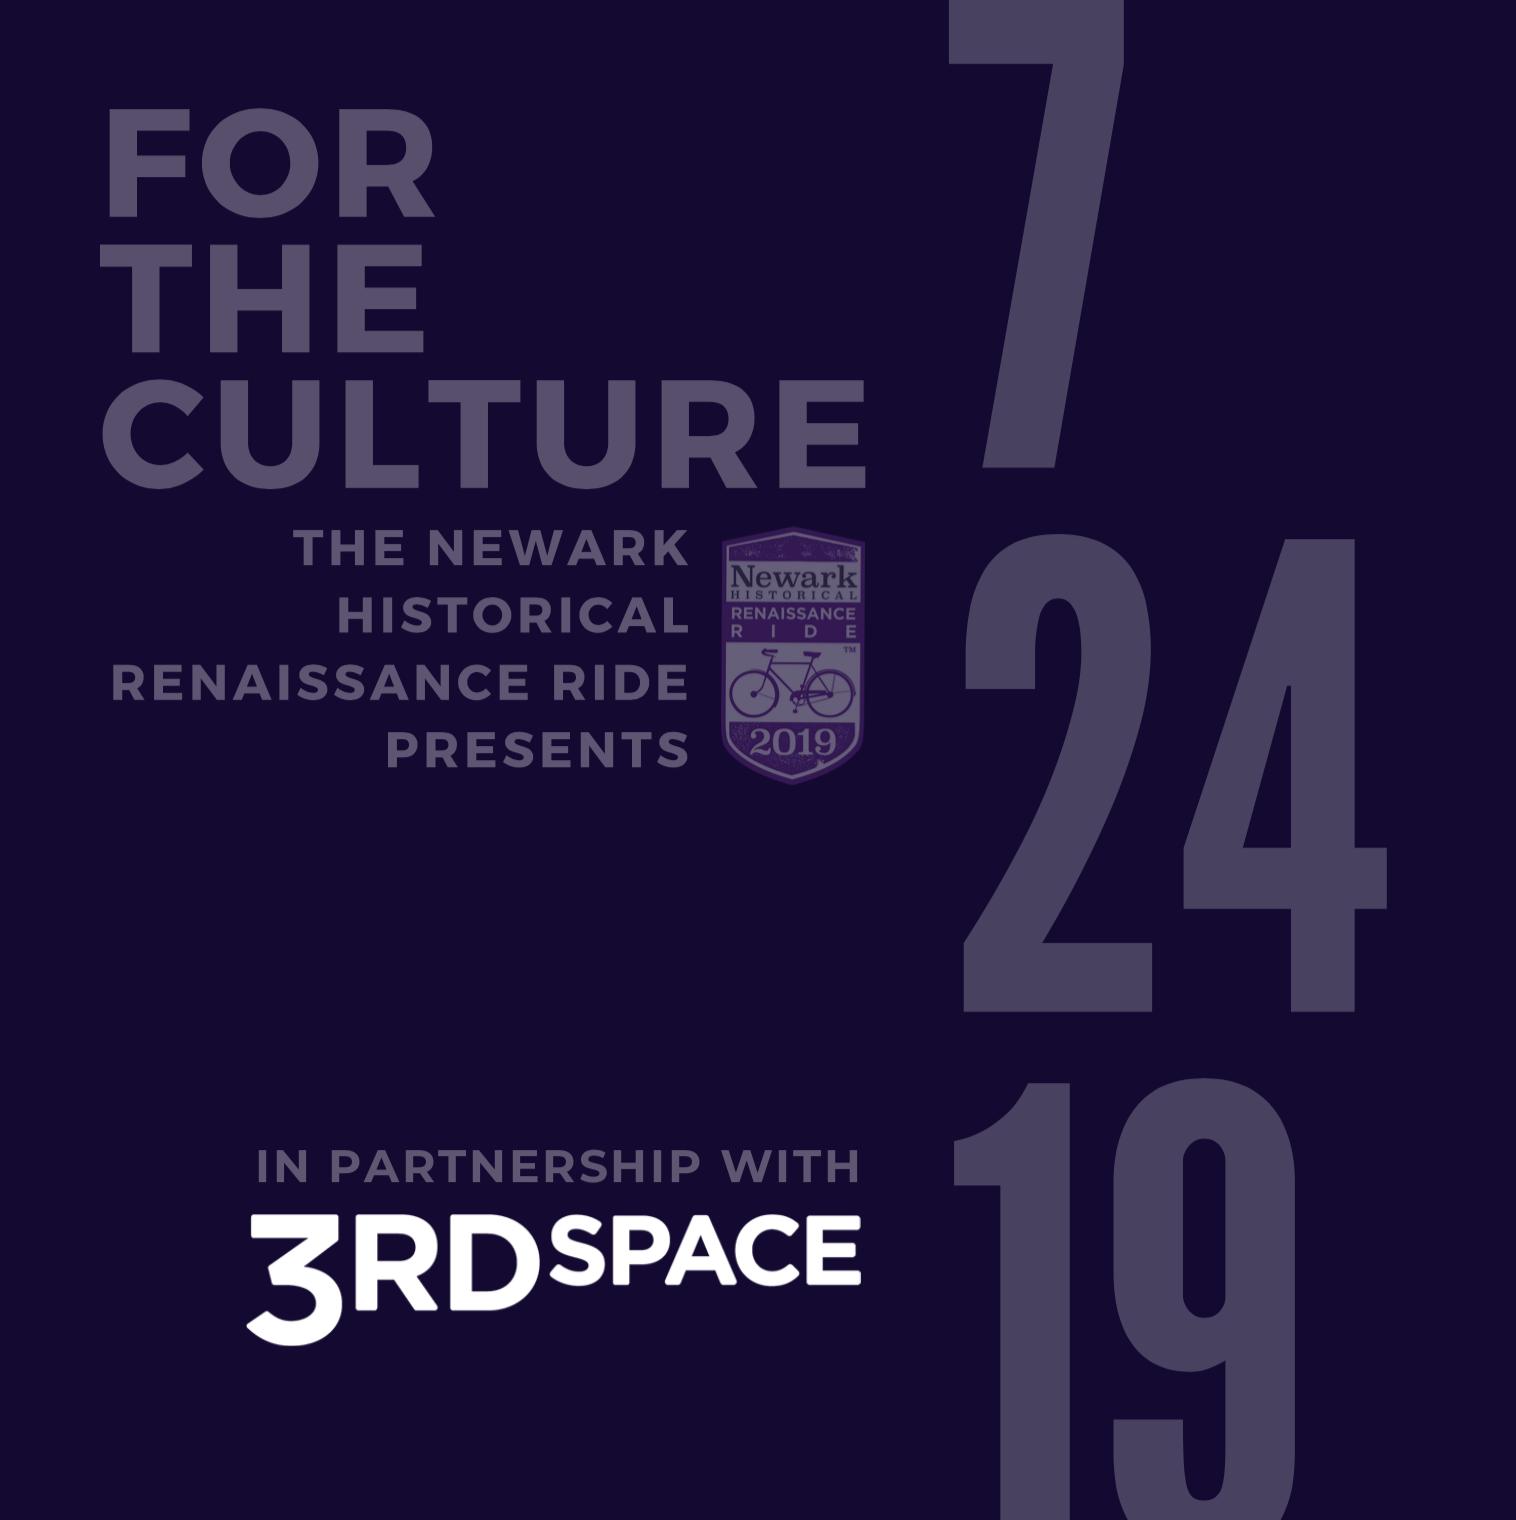 Renaissance Ride Presents: For The Culture